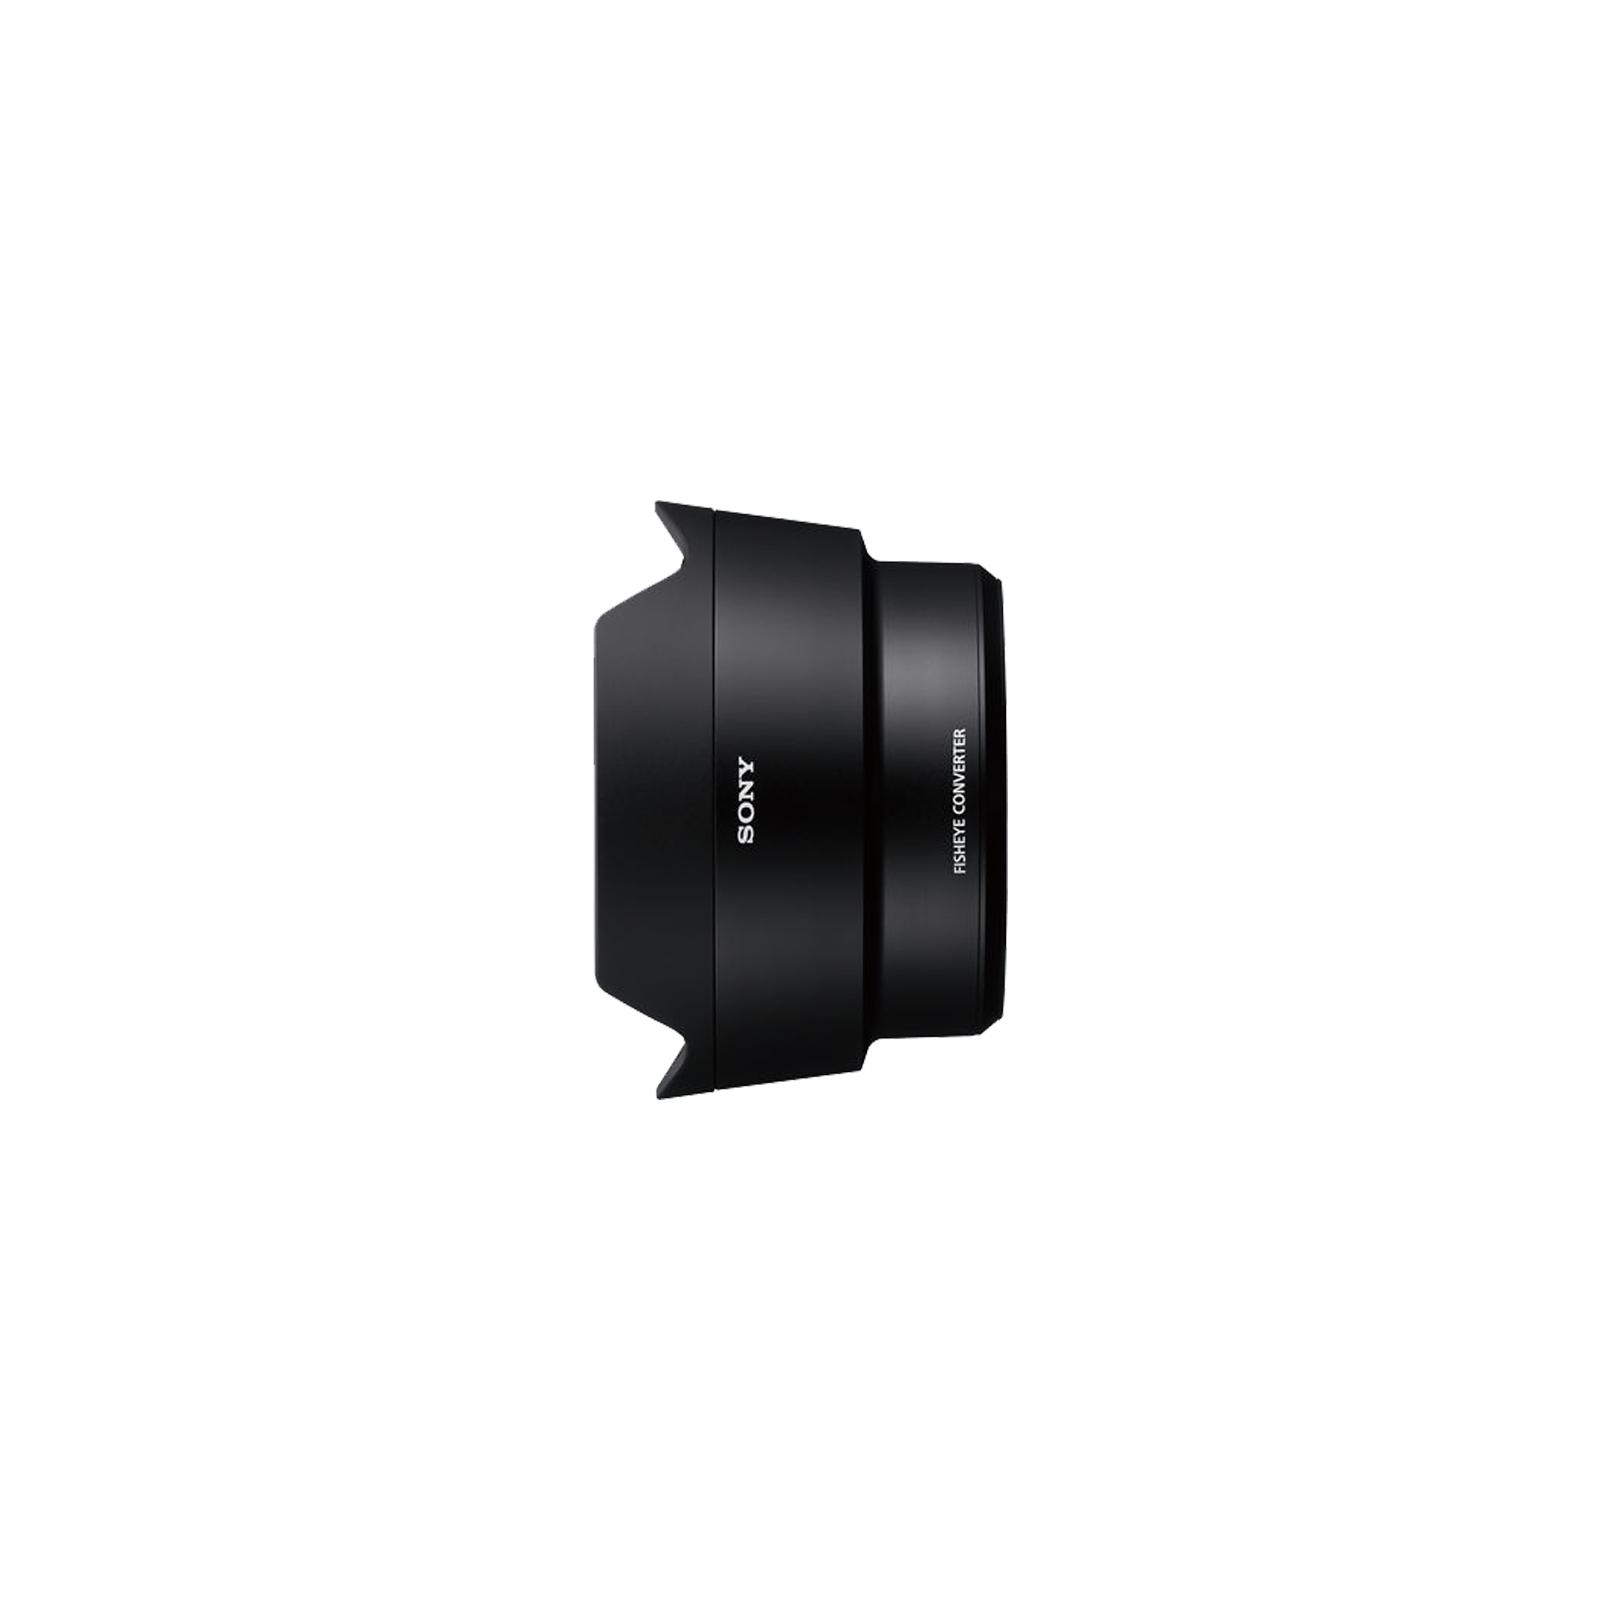 Фото-адаптер SONY Fisheye для SEL 28mm f2.0 FE (SEL057FEC.SYX) изображение 2